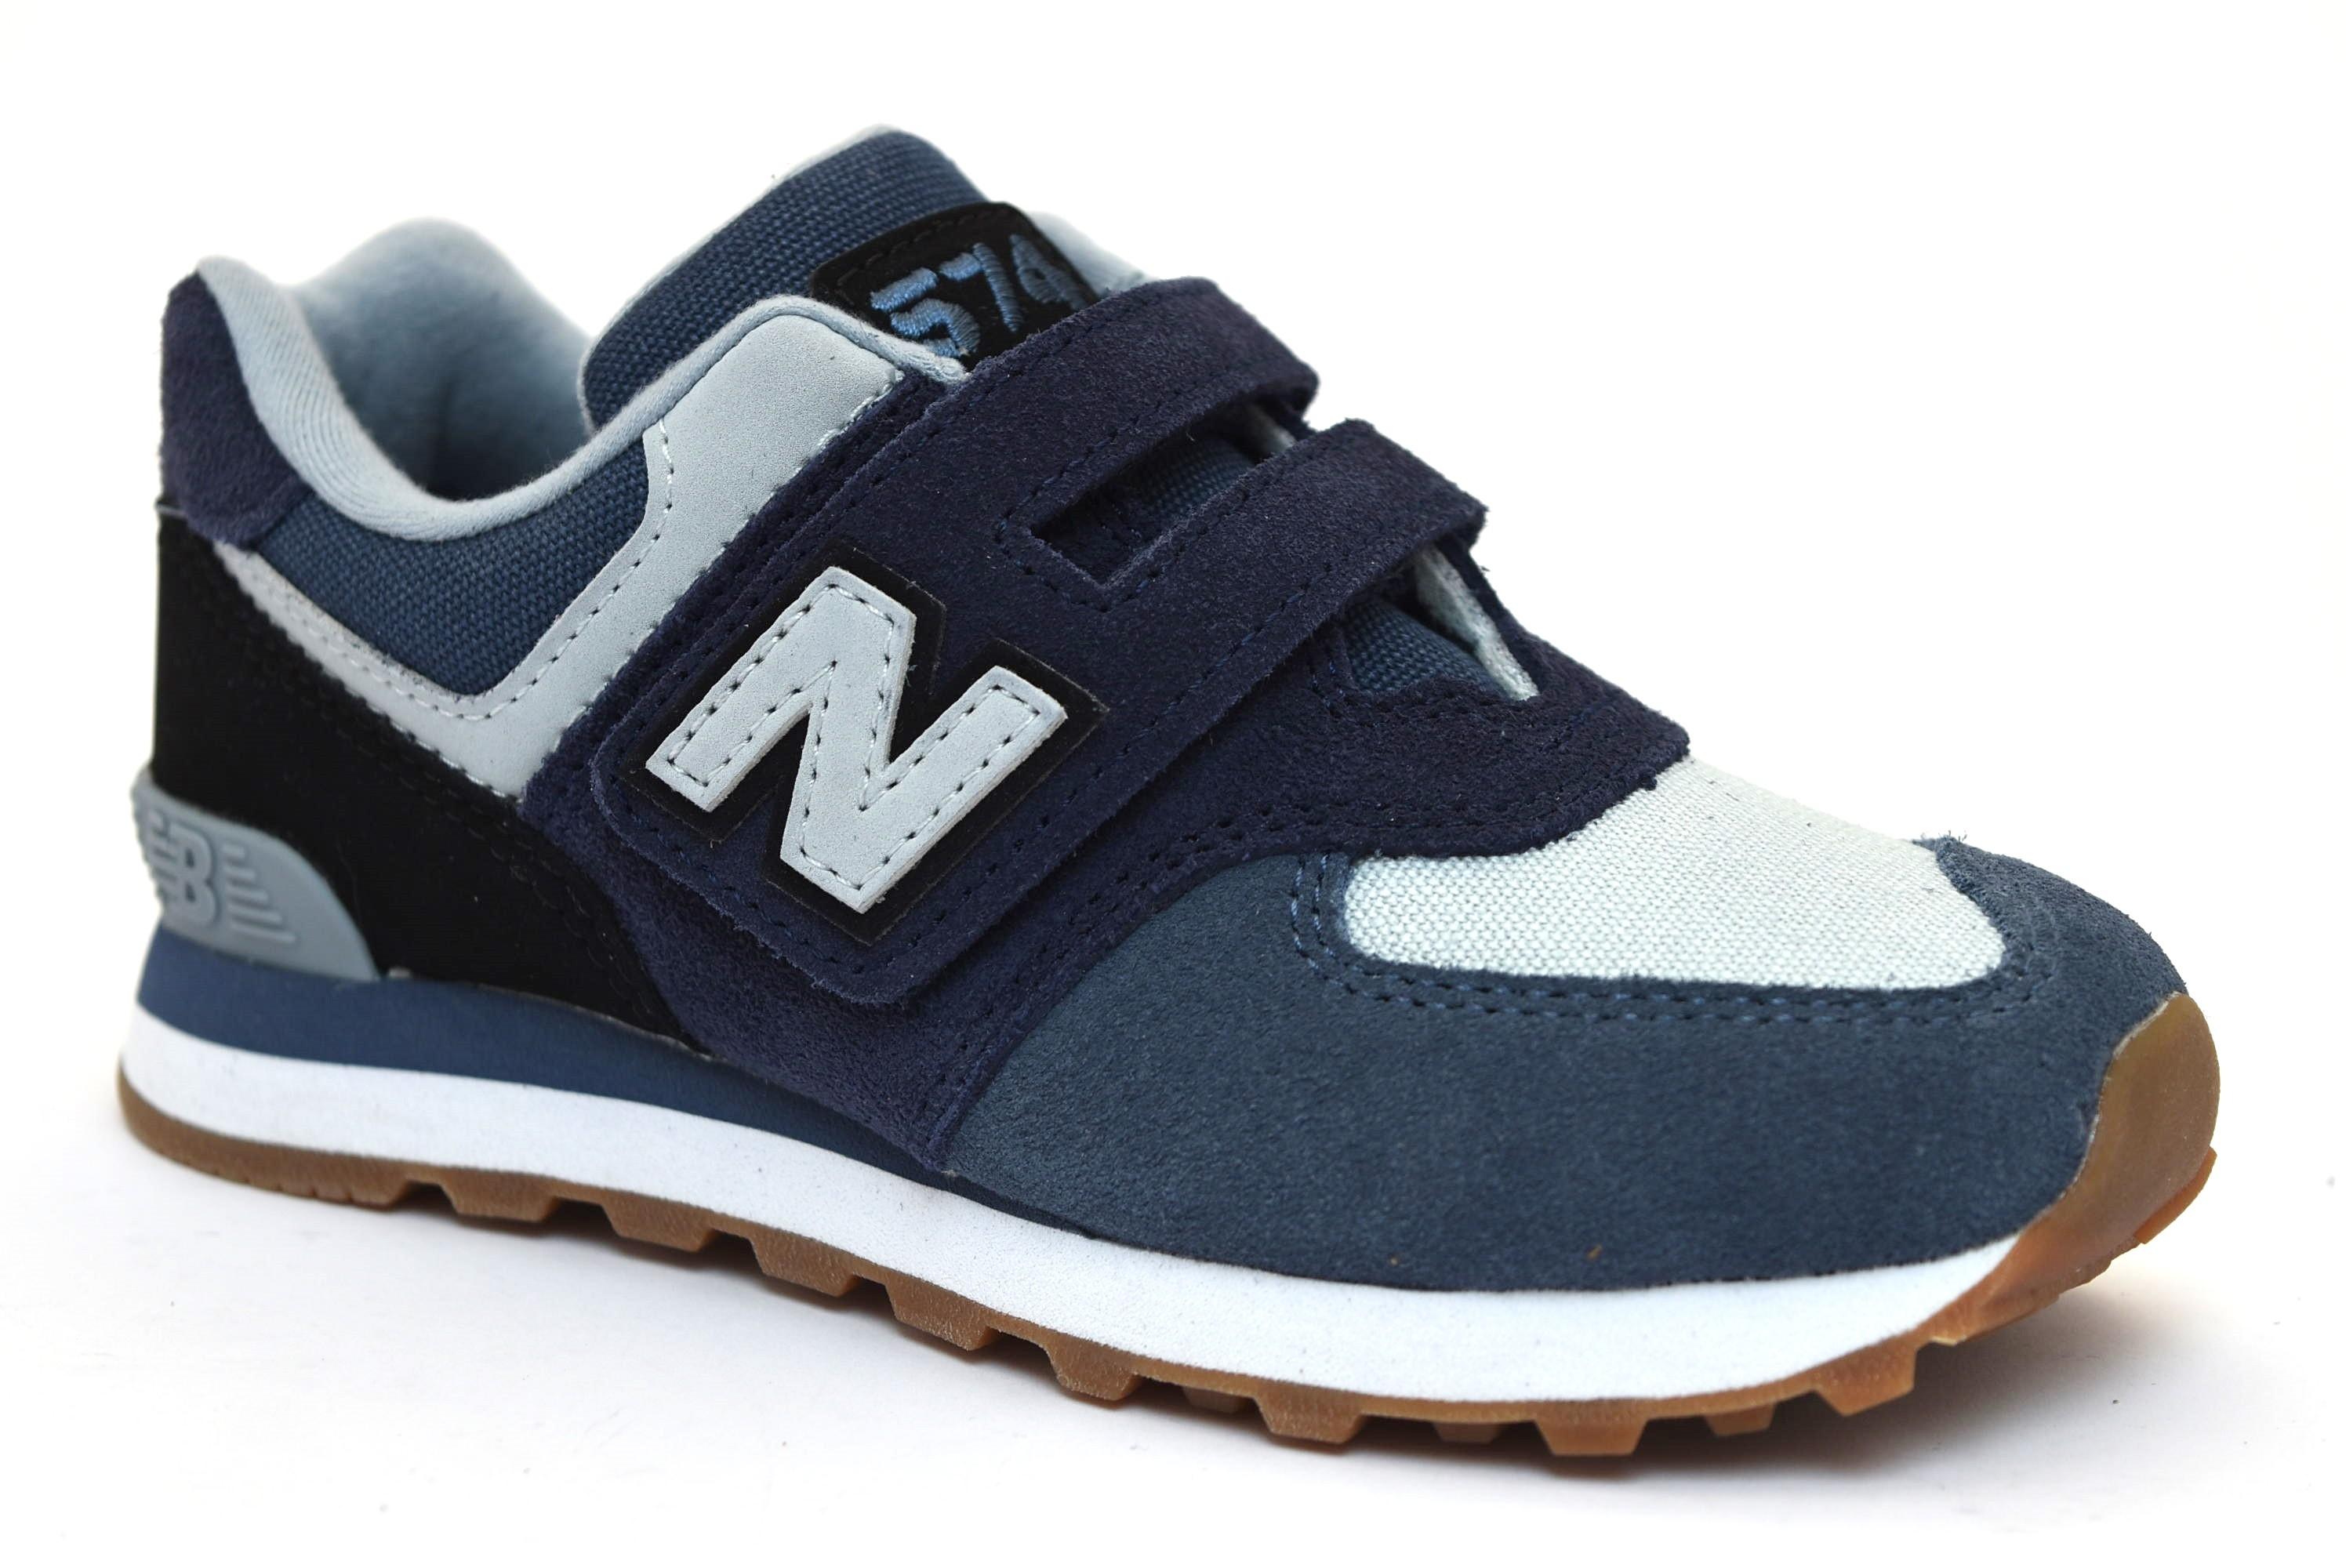 scarpe new balance firenze